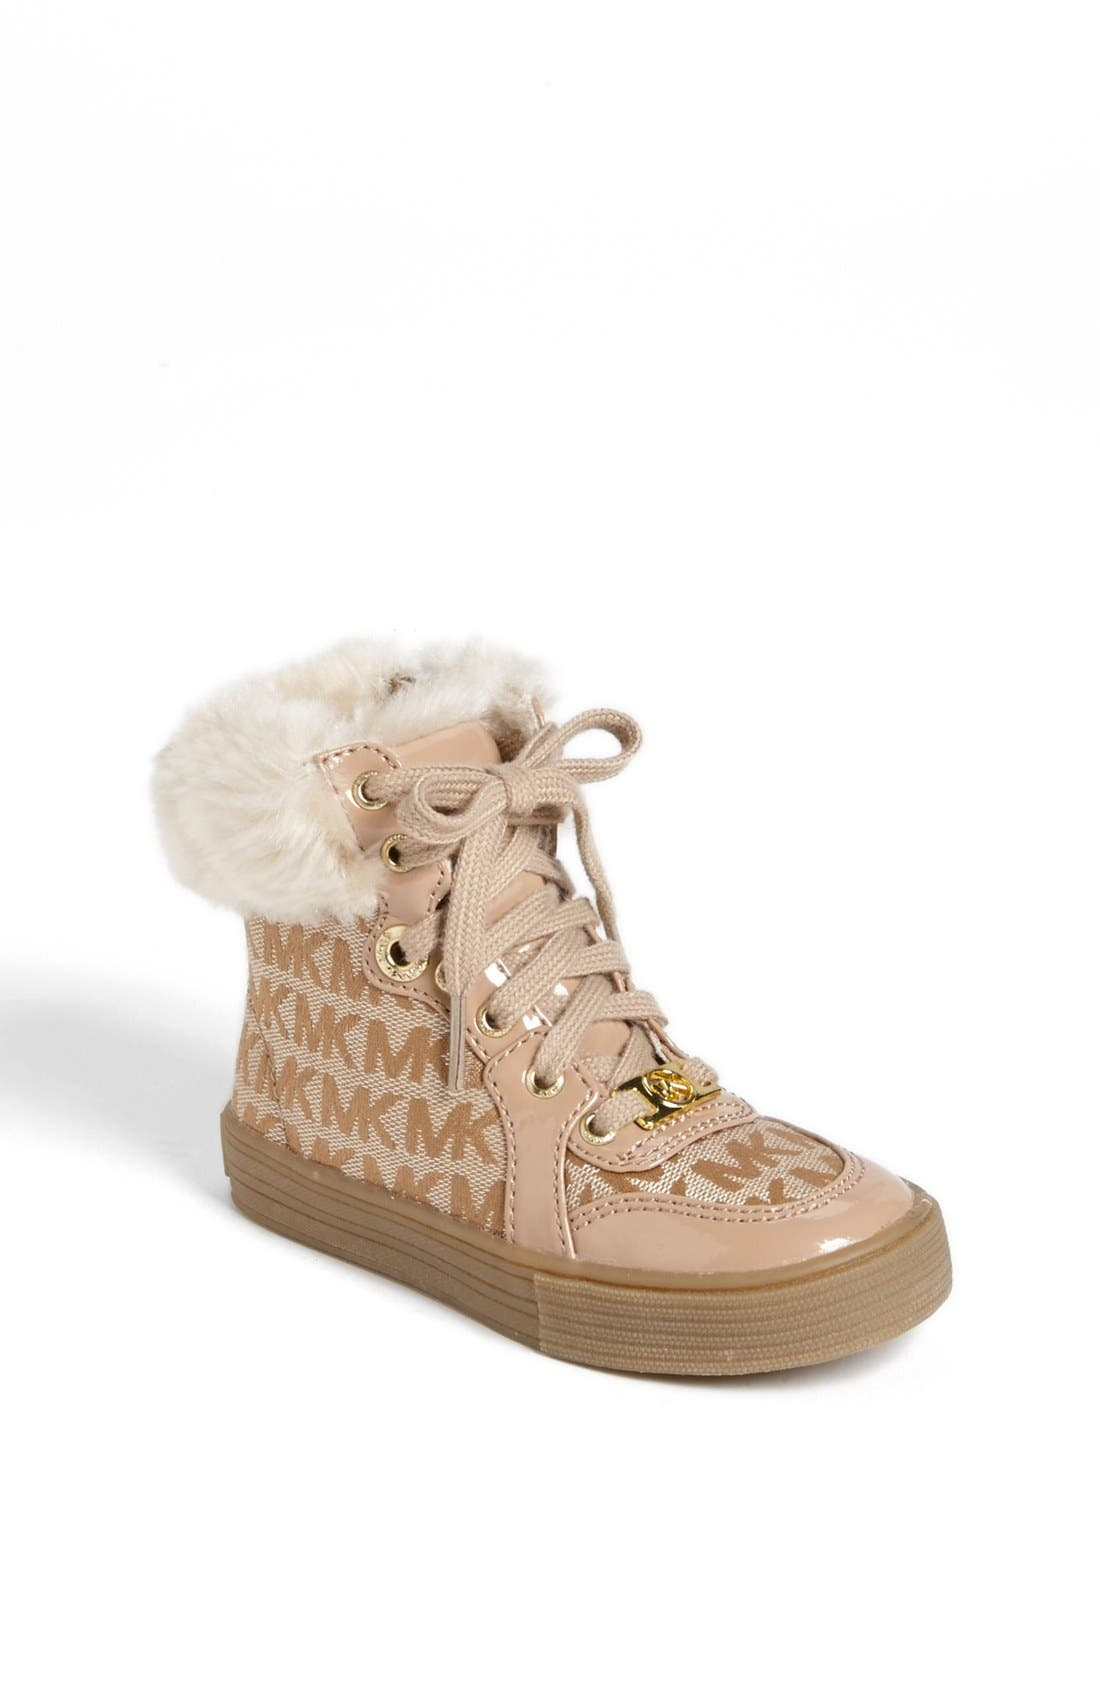 Alternate Image 1 Selected - MICHAEL Michael Kors 'Ivy' Faux Fur High Top Sneaker (Little Kid)